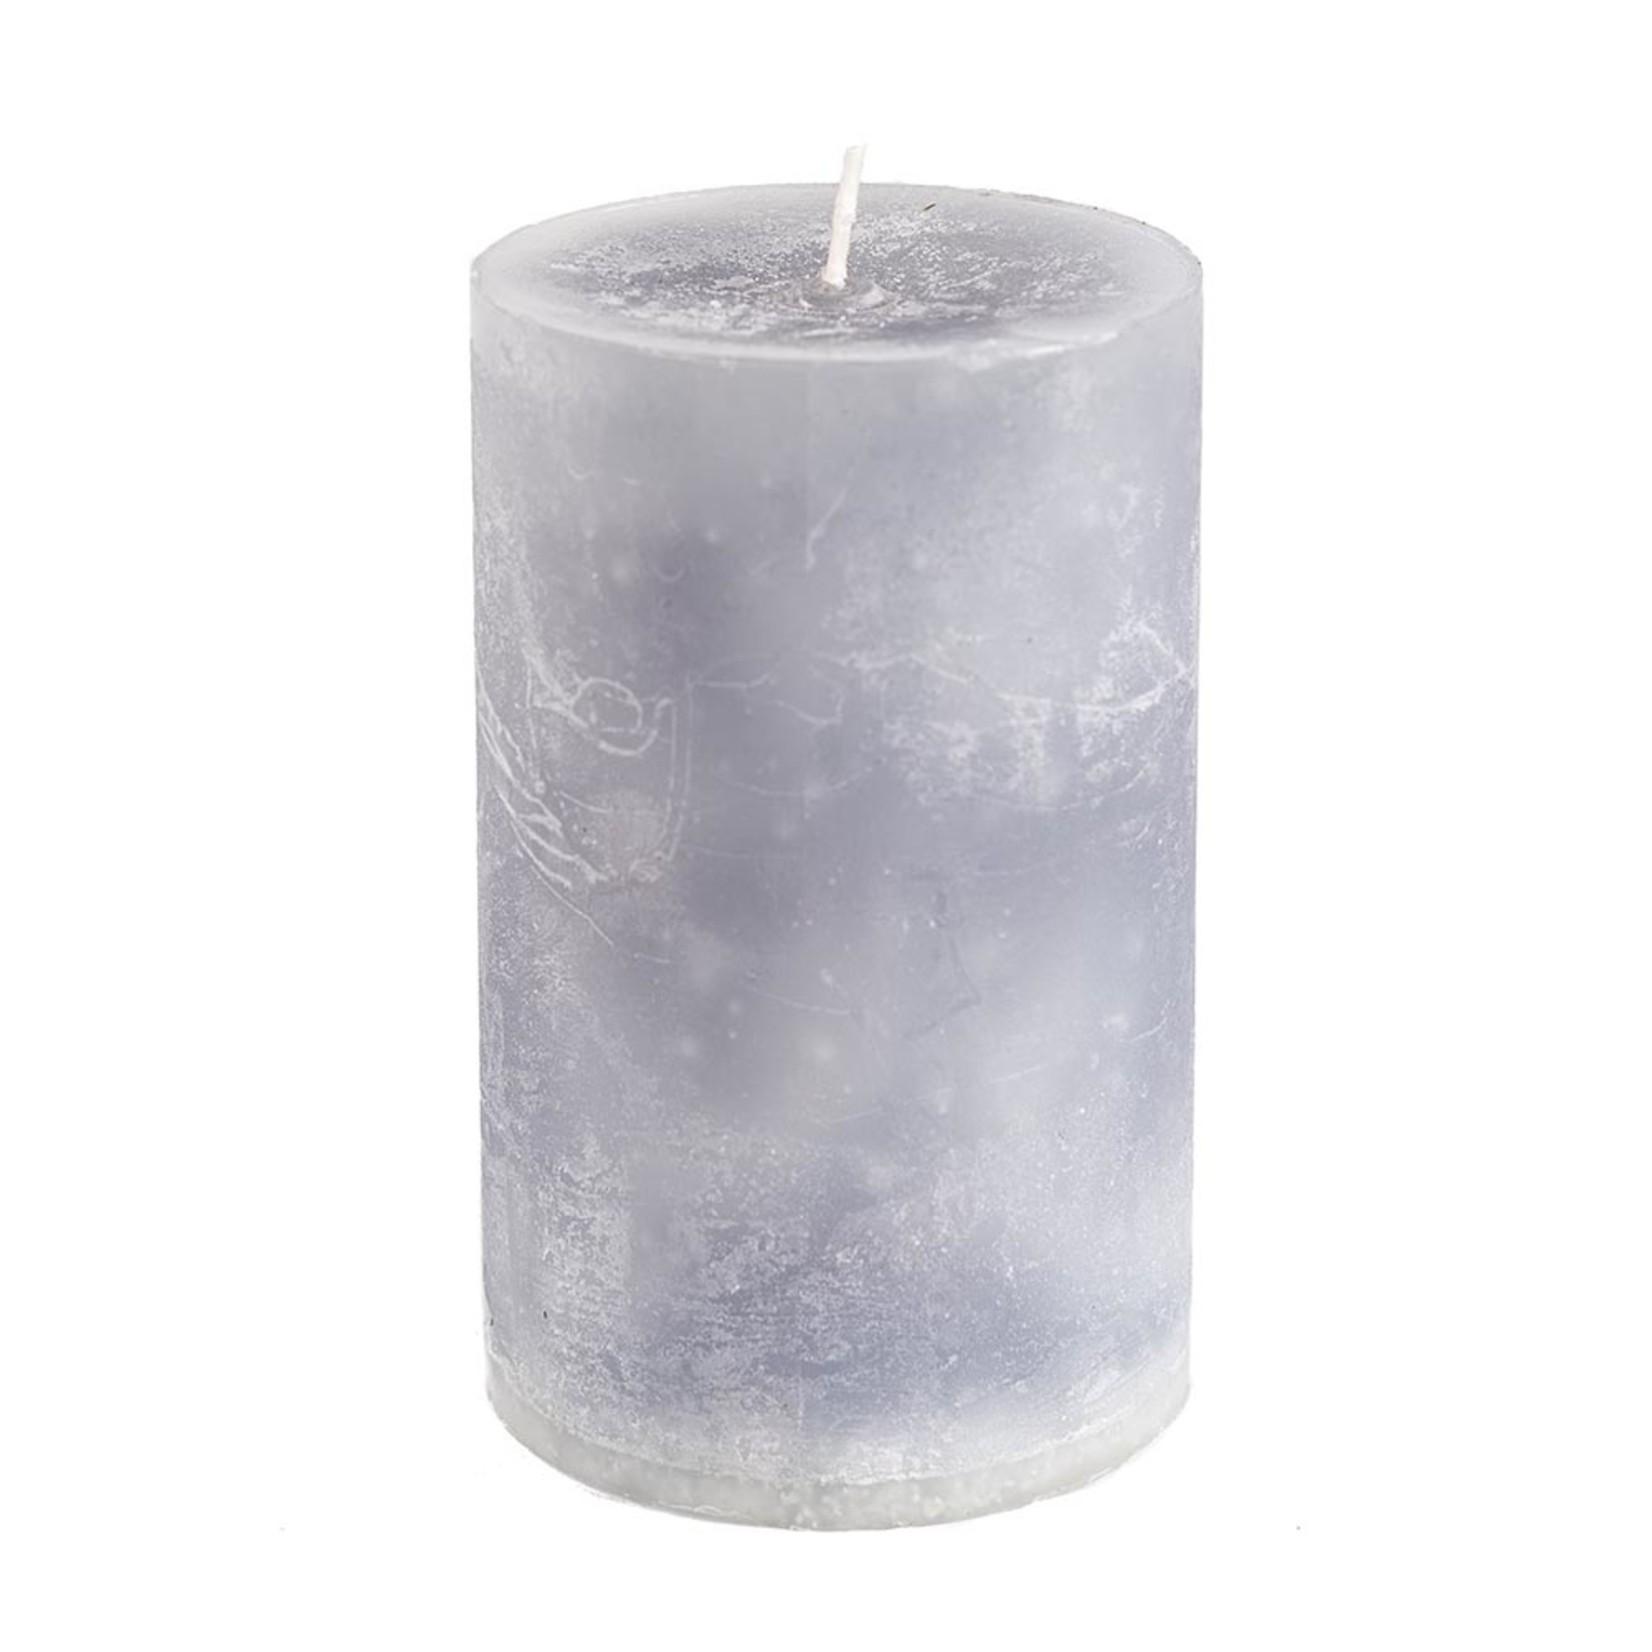 Home Society Pillar Candle 9x15cm Grey